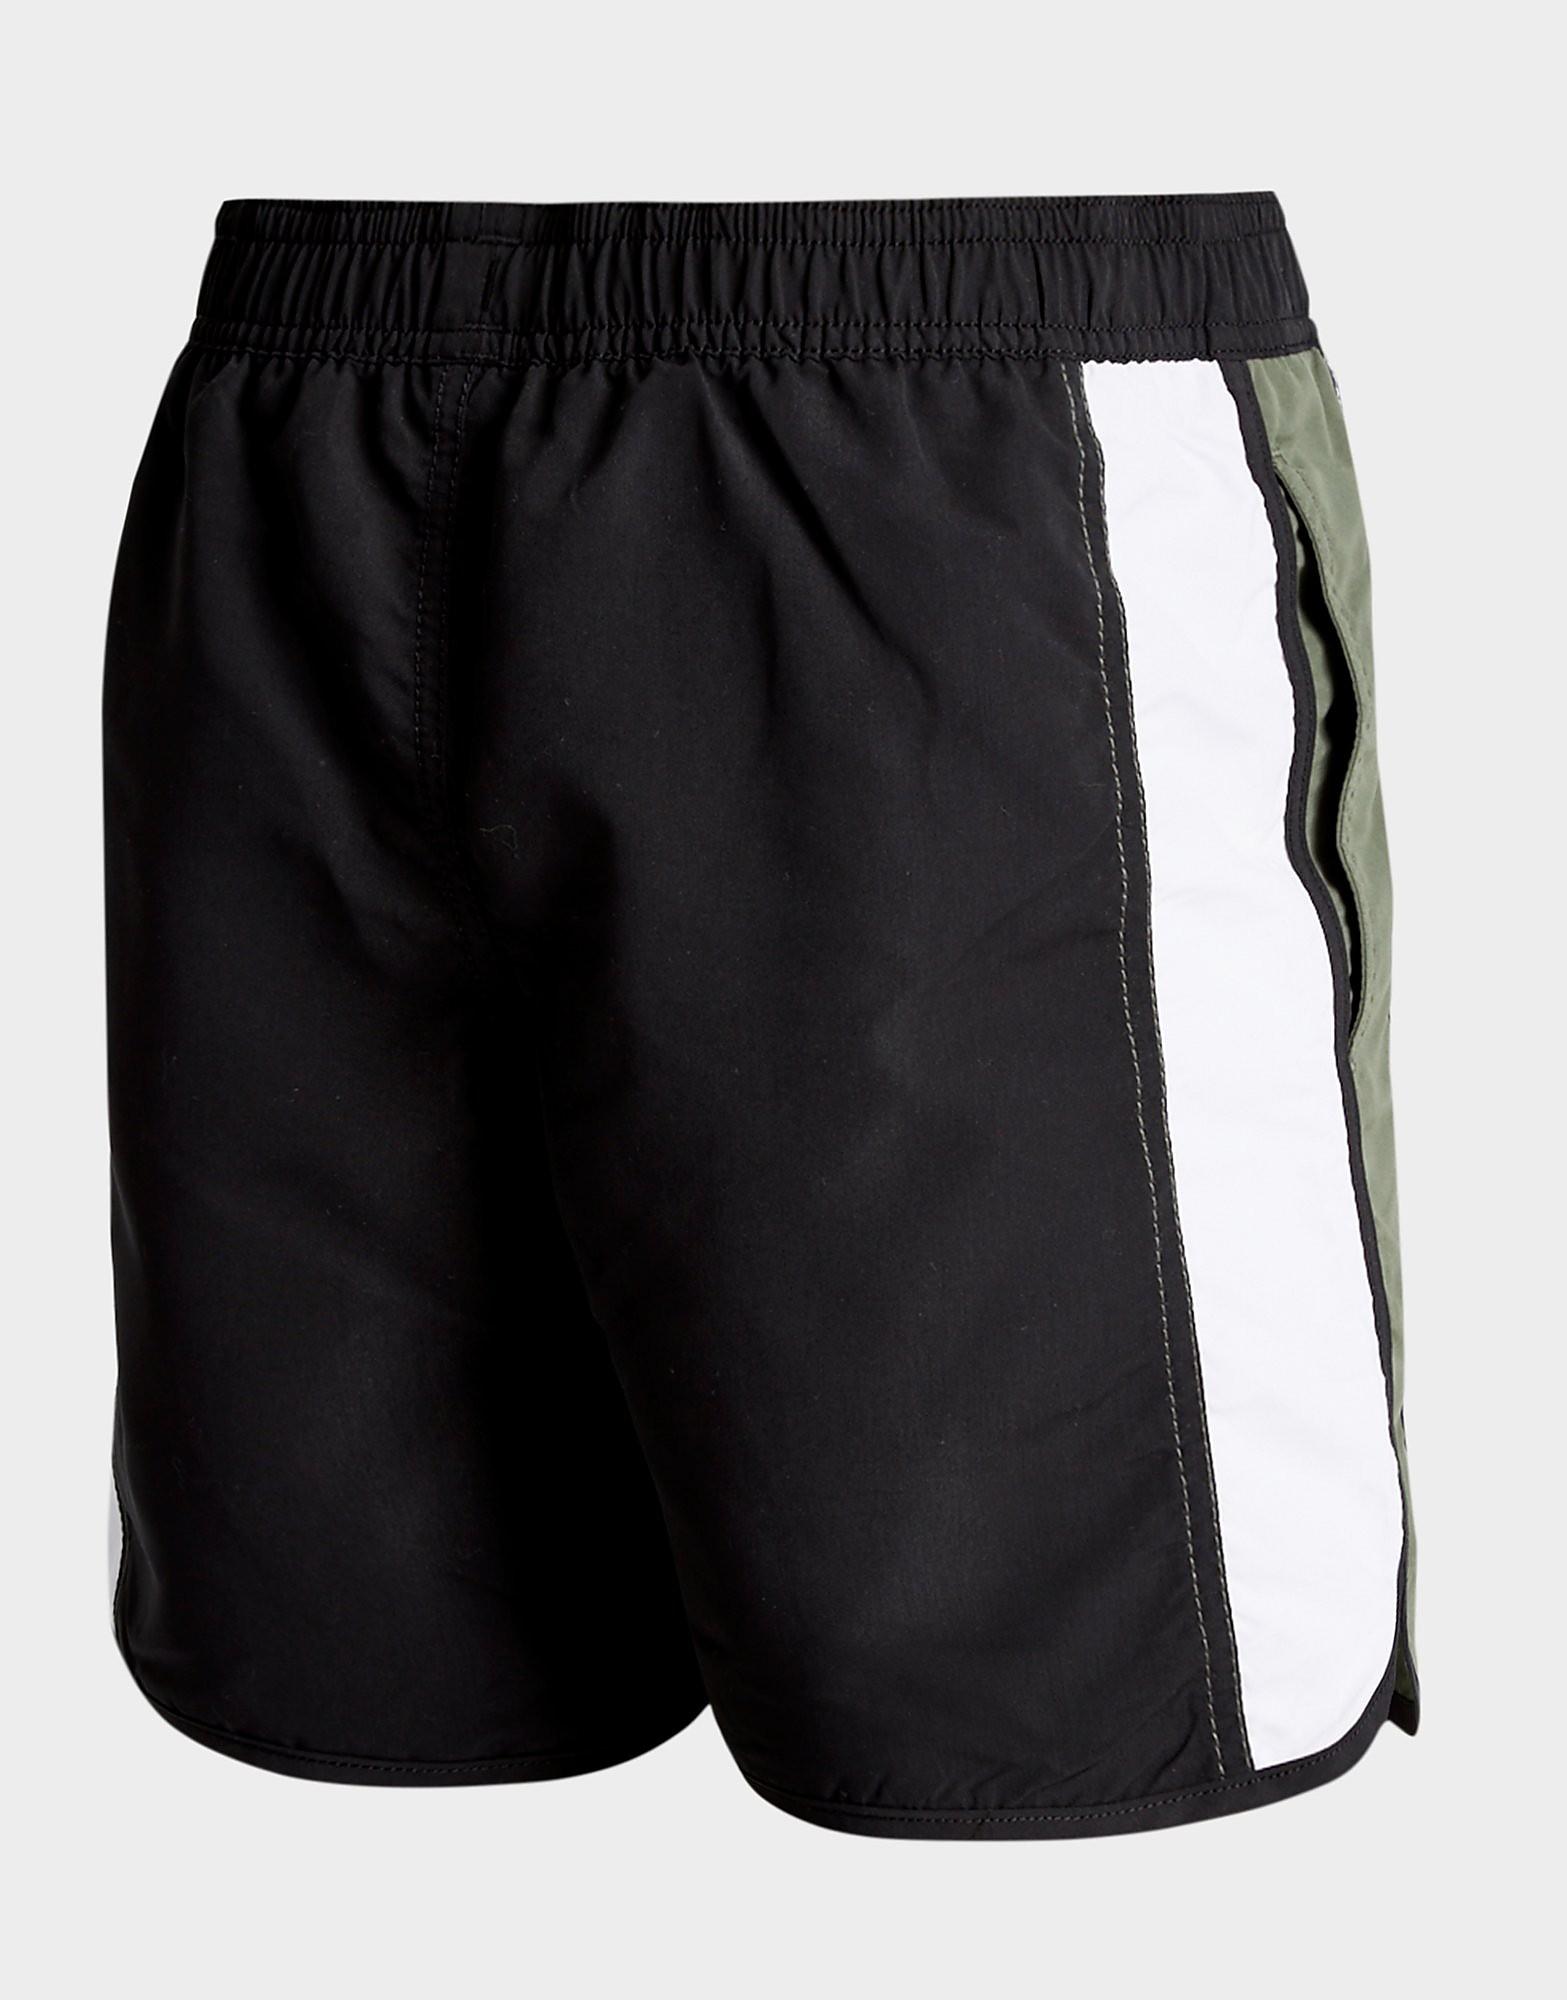 Emporio Armani EA7 Colour Block Swim Shorts Junior